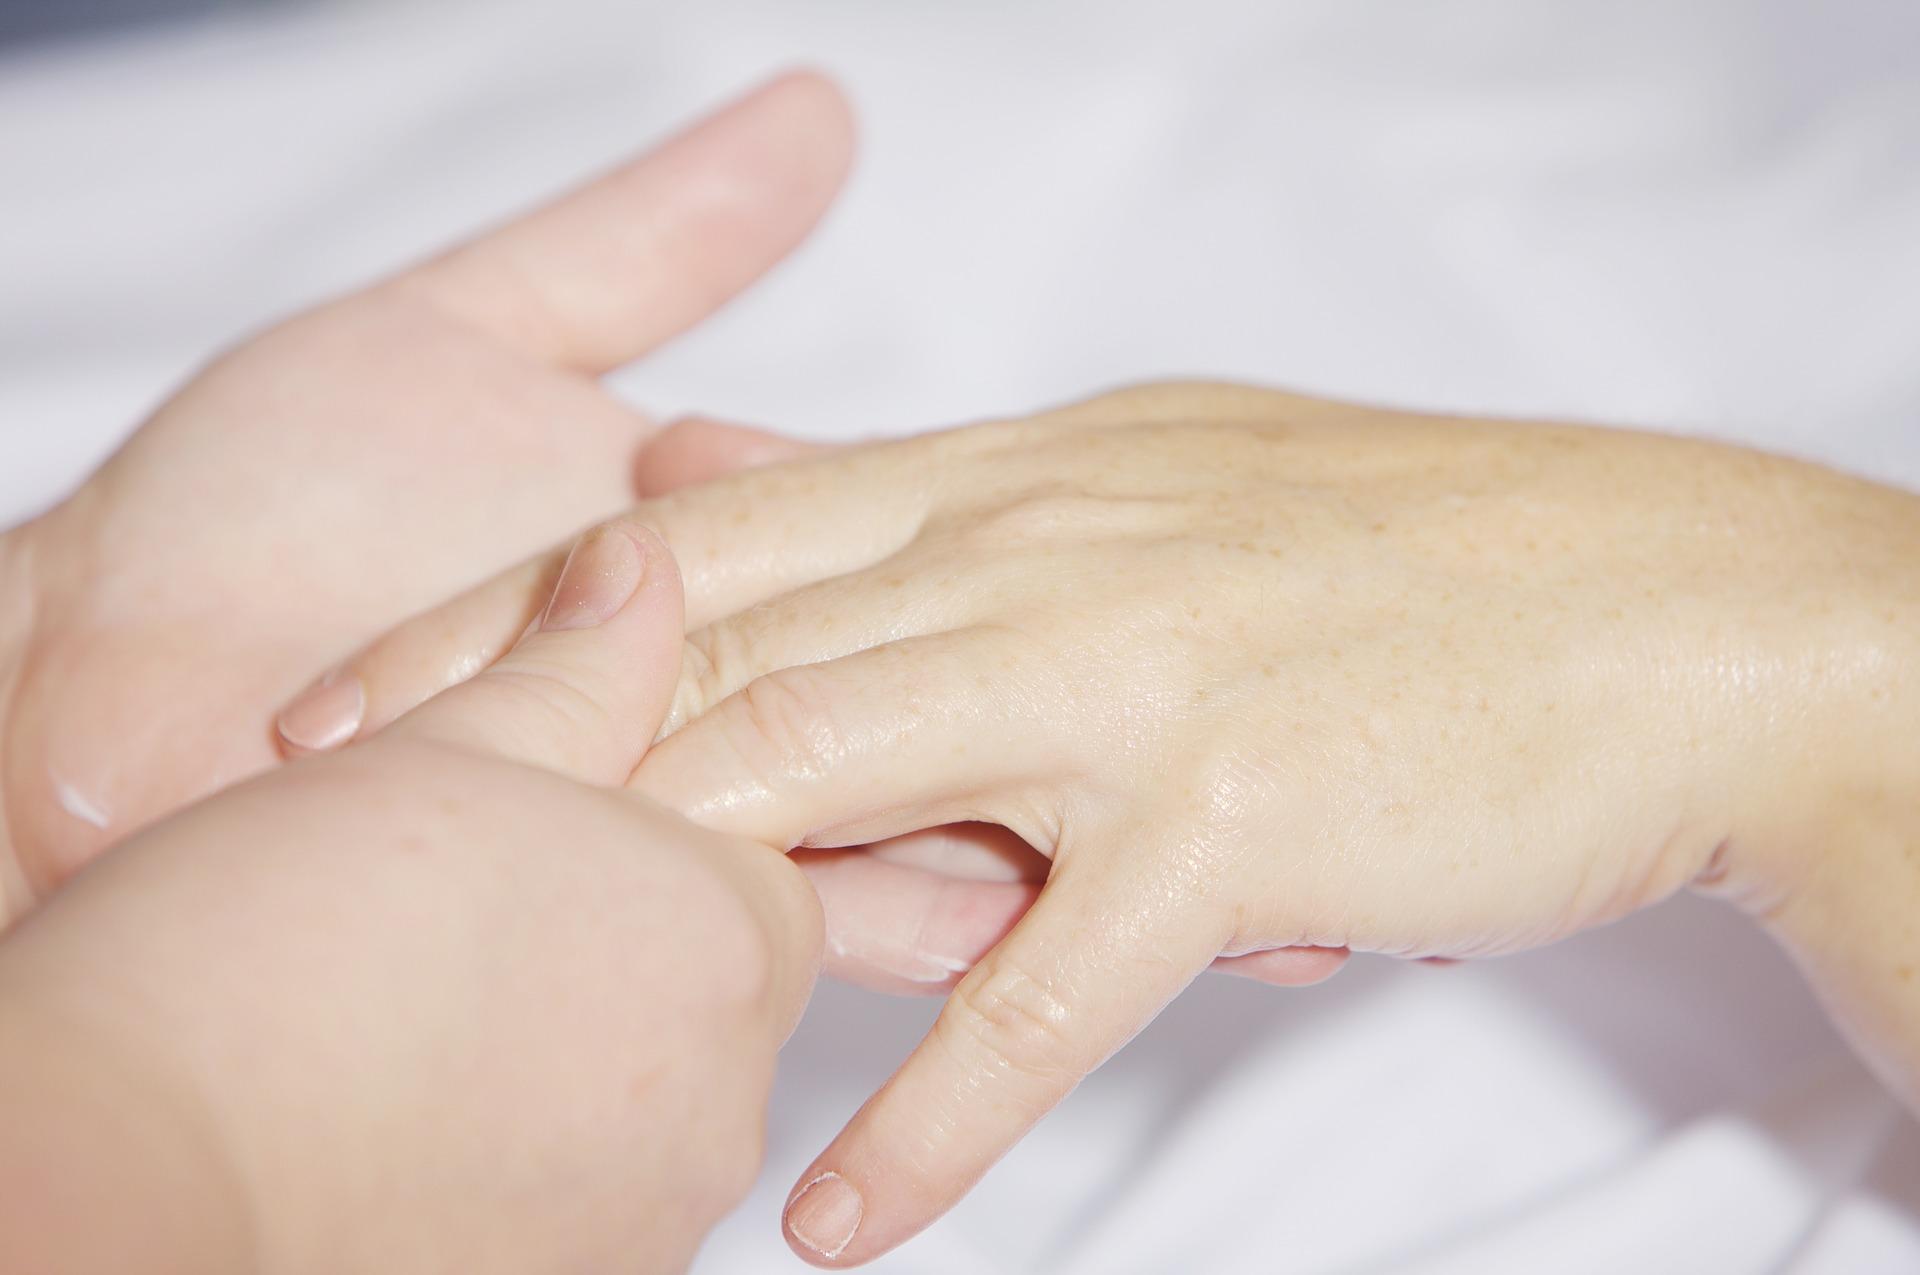 Сухая кожа рук у мужчины